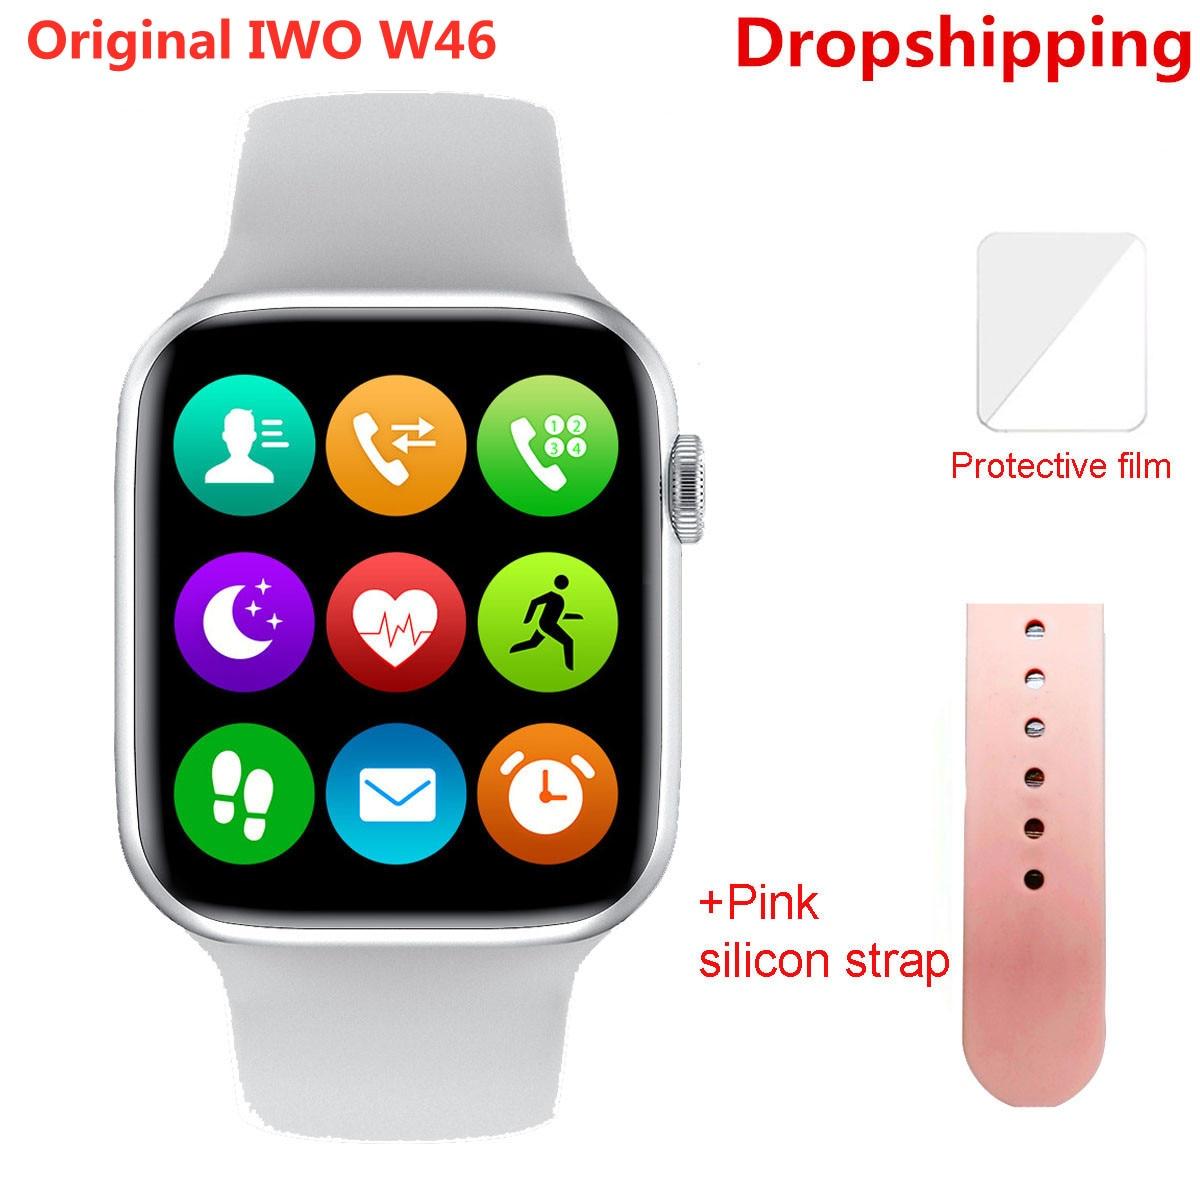 W46 we-add-a-pink